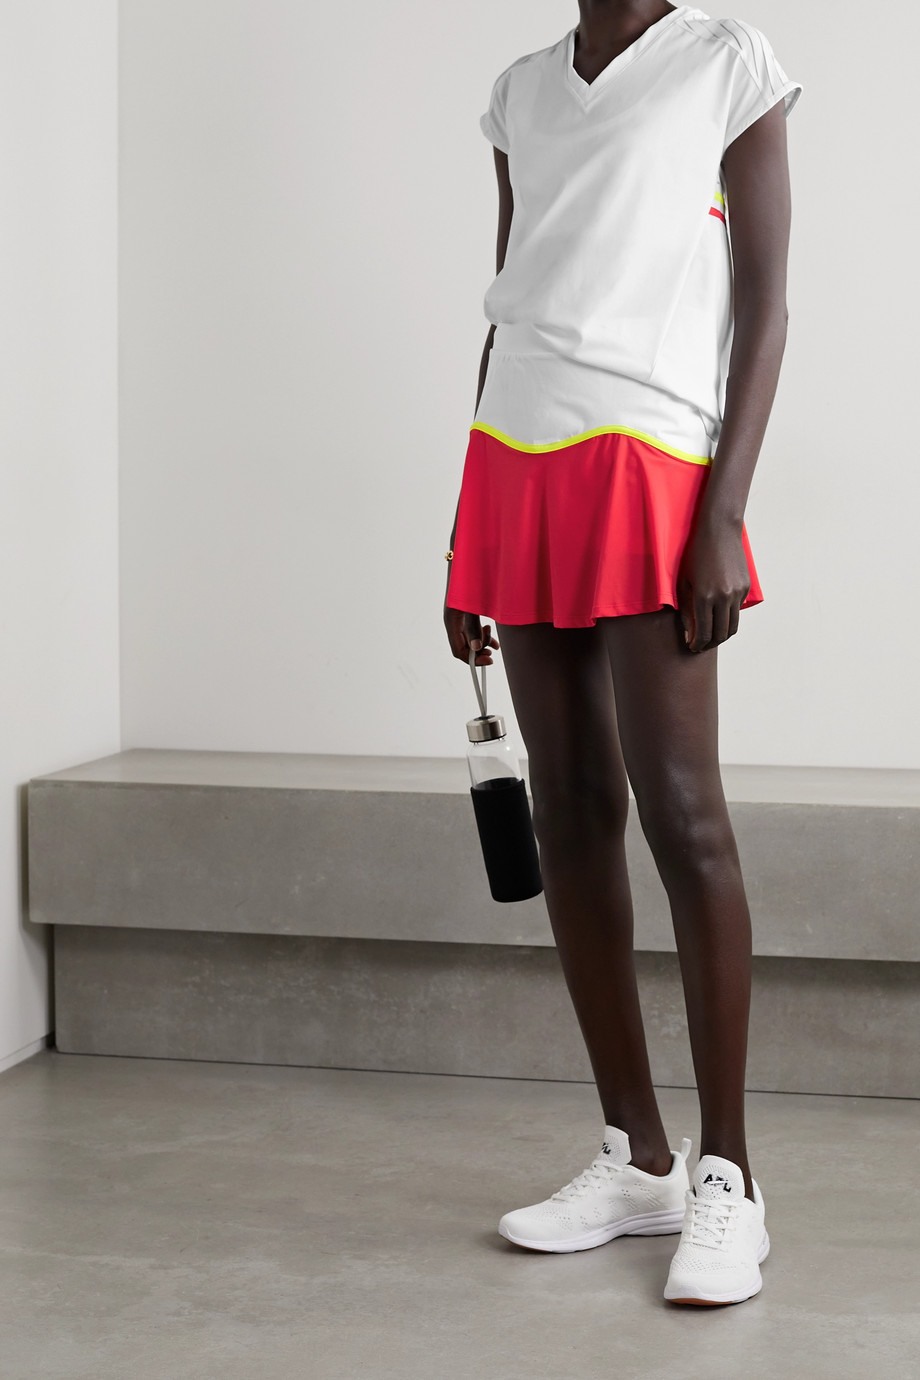 L'Etoile Sport Color-block stretch-jersey tennis skirt